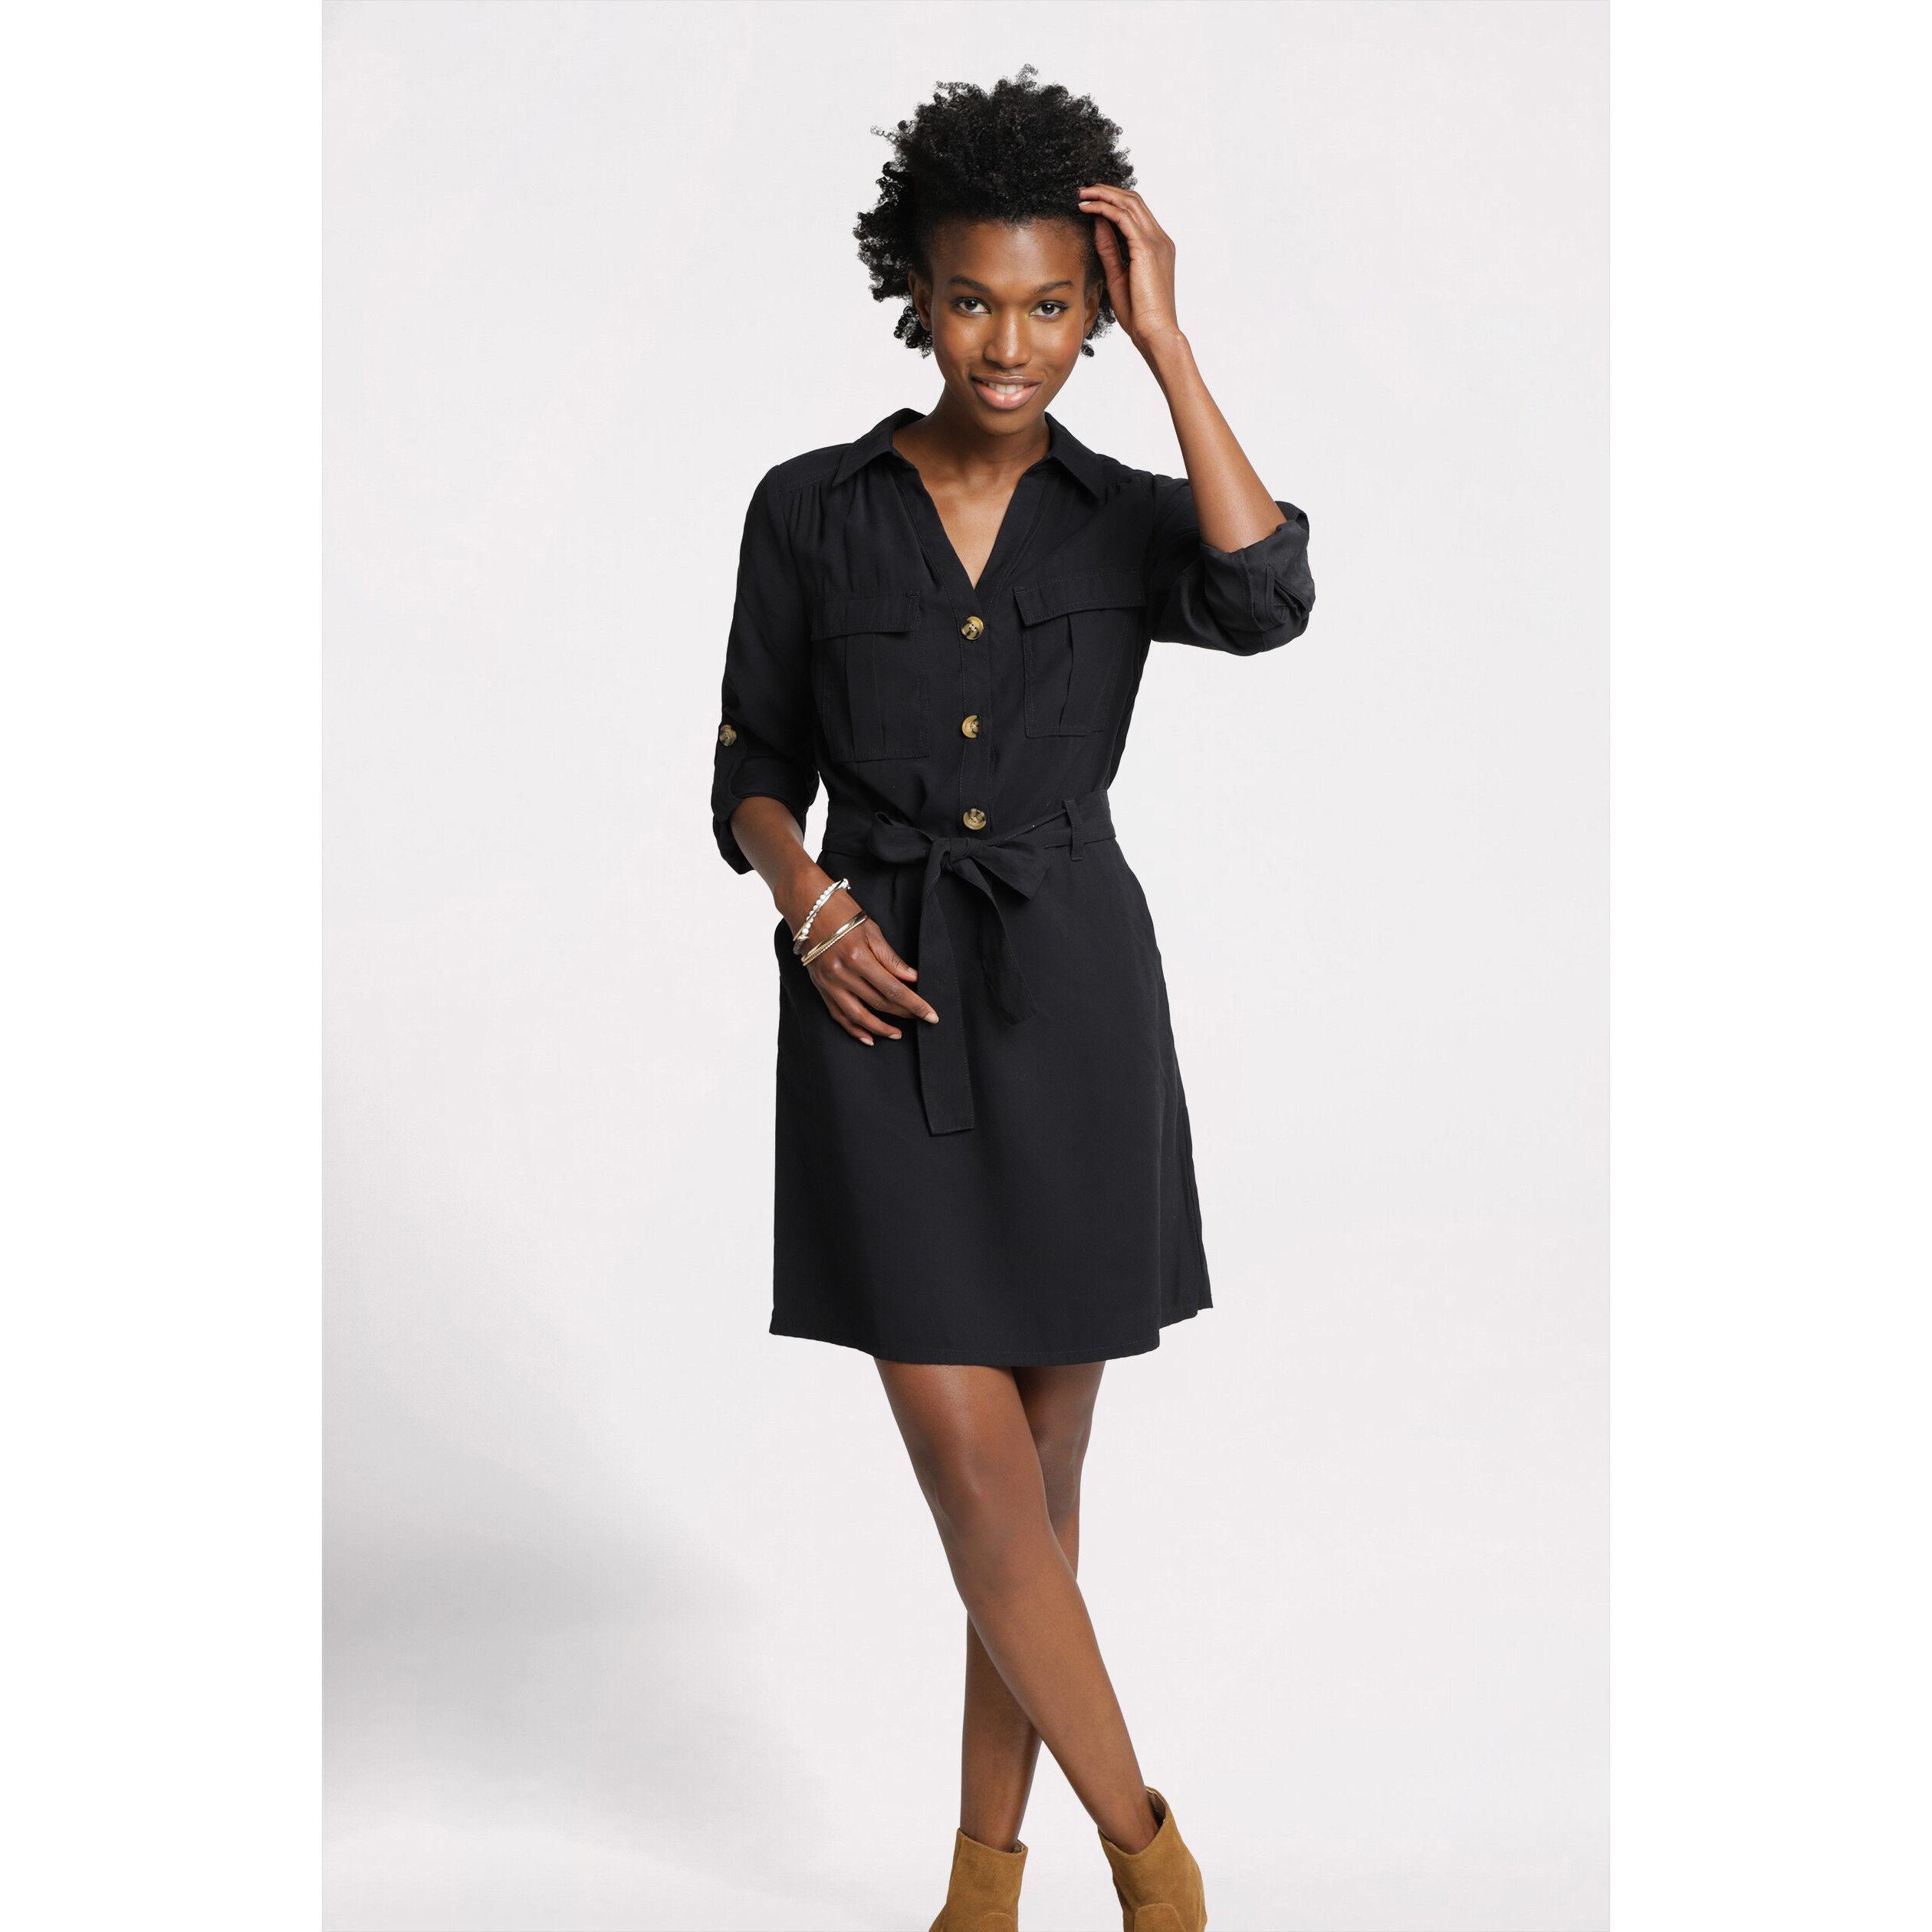 Noir FemmeVib's Noir Robes Cachecache FemmeVib's Robes Cachecache Robes Cachecache Noir TJK1ulF3c